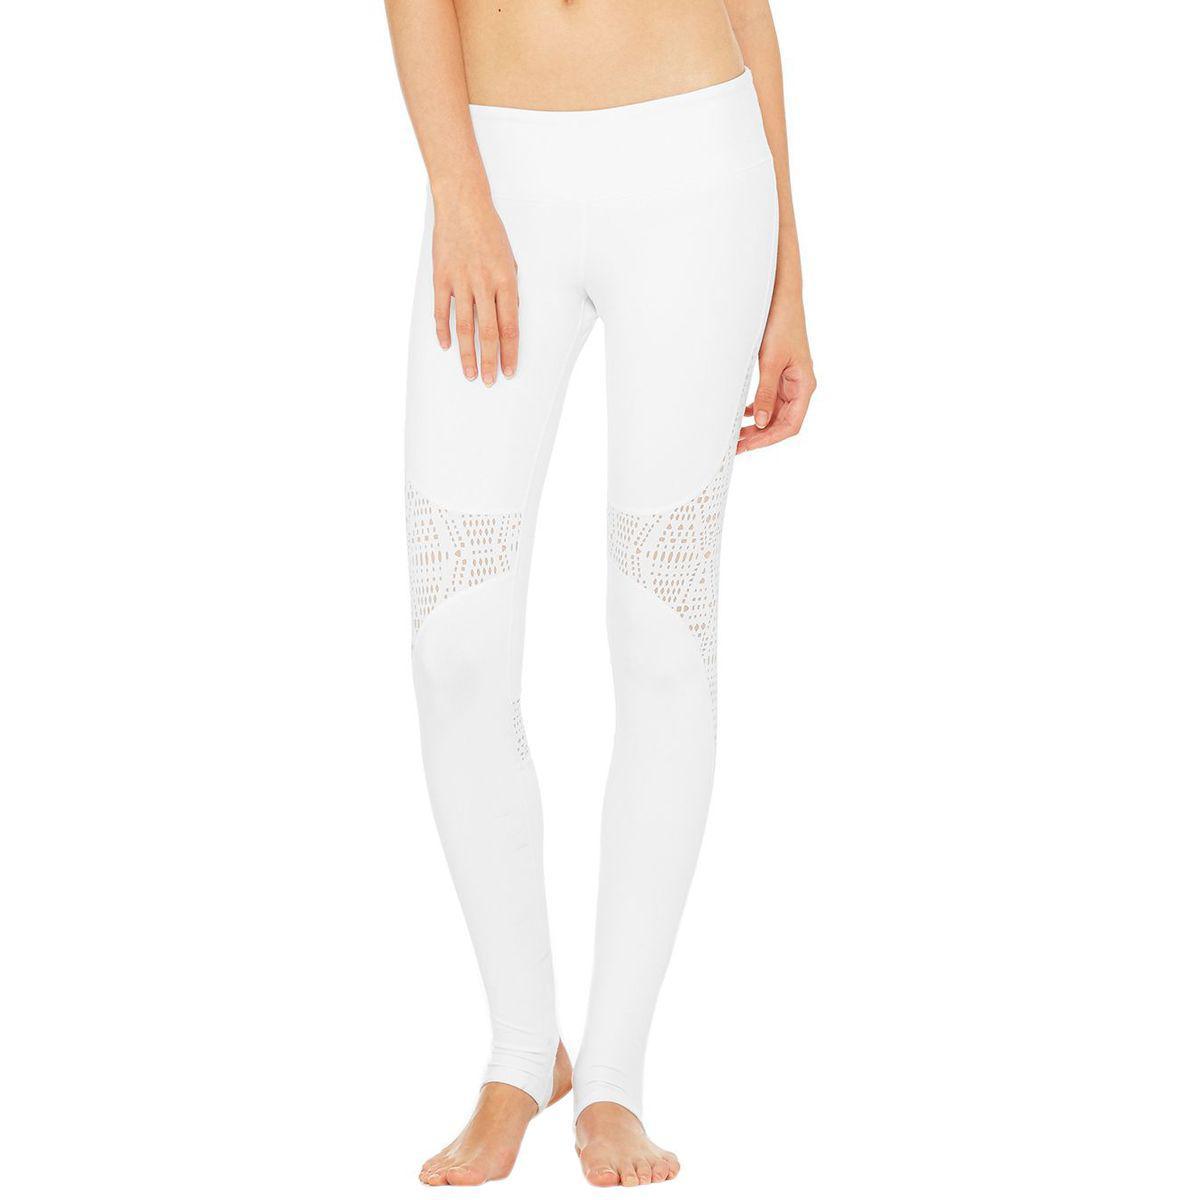 535be705597f0 Lyst - Alo Yoga West Coast Legging in White